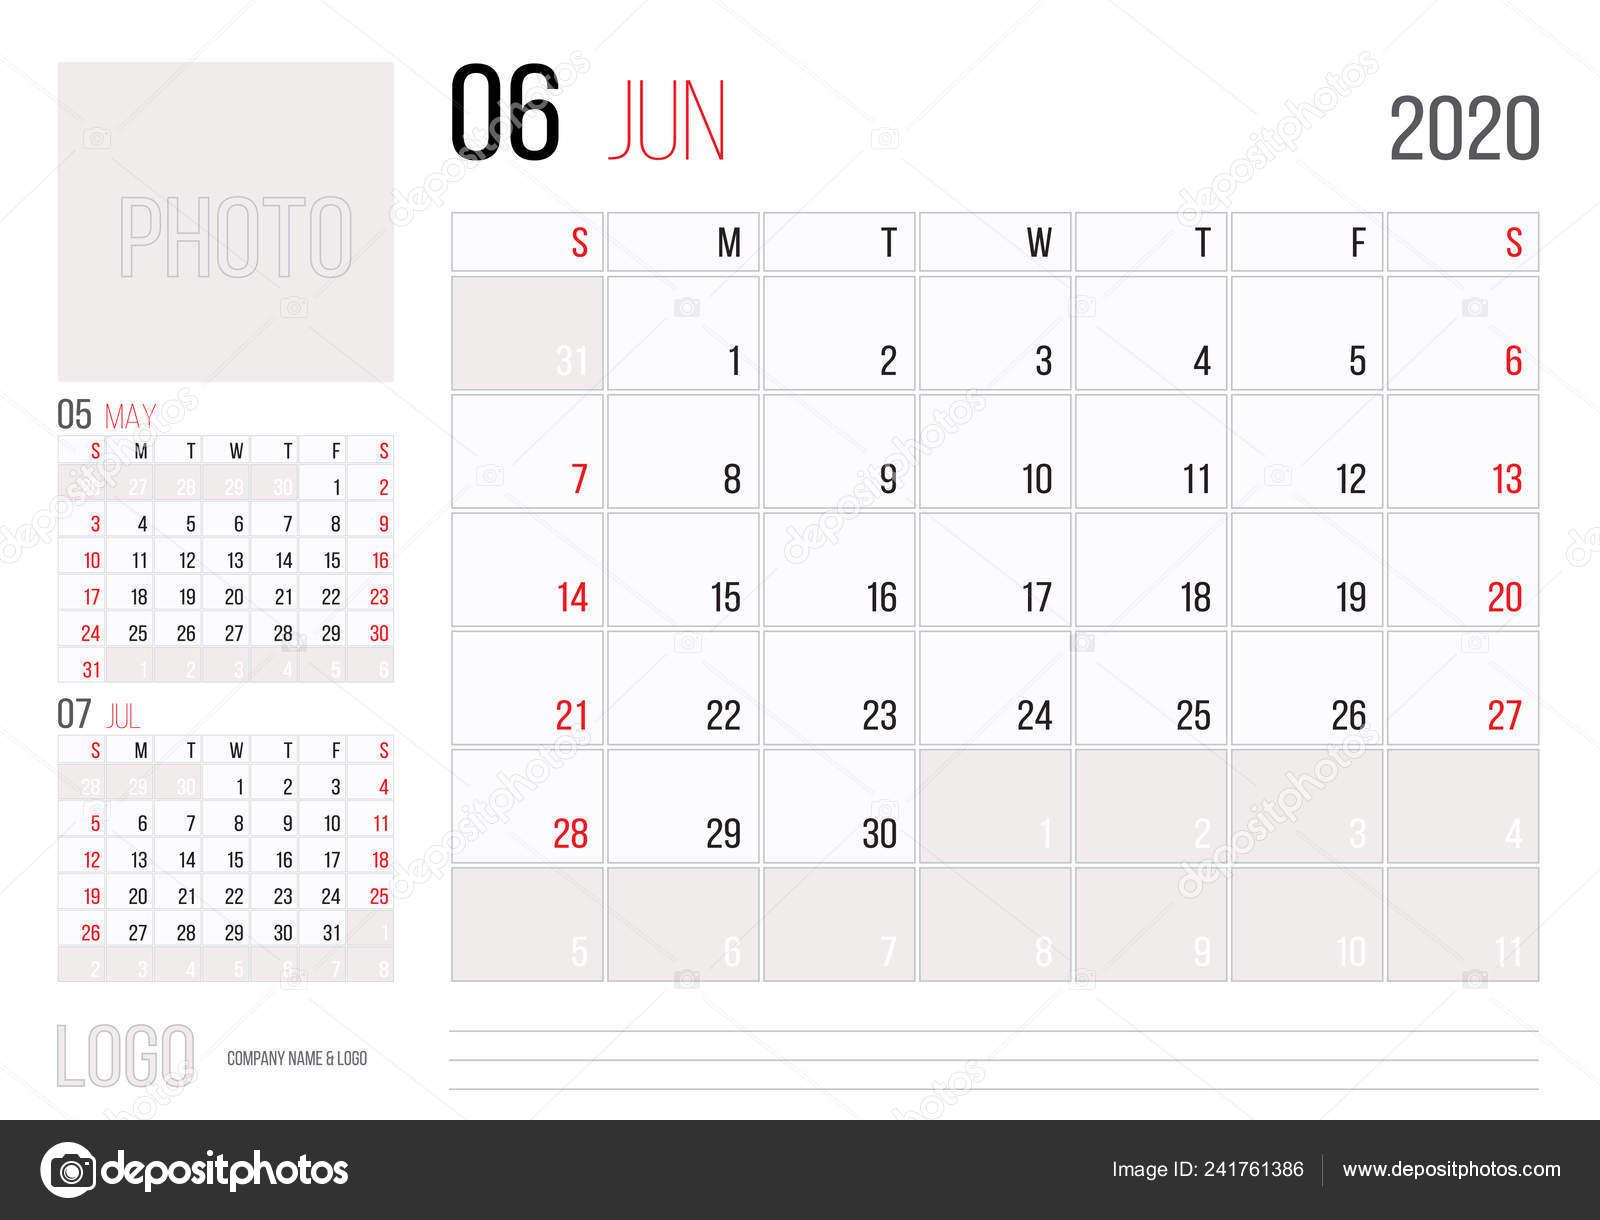 2020 Annual Calendar.Calendar 2020 Planner Corporate Template Design June Week Starts